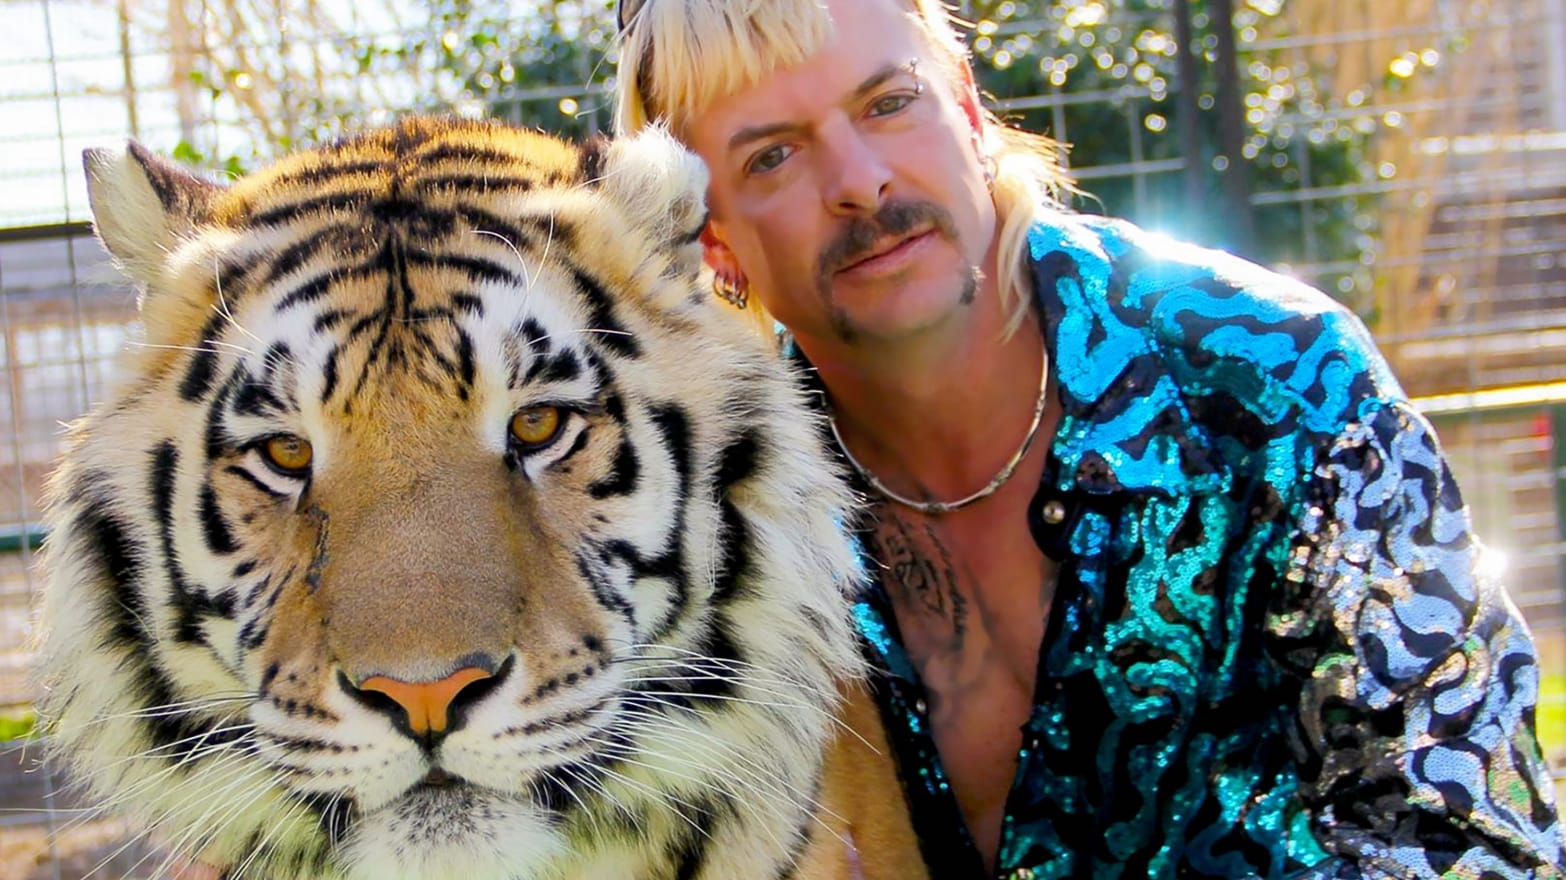 Tiger-King-Joe-Exotic-marijuana-legalization